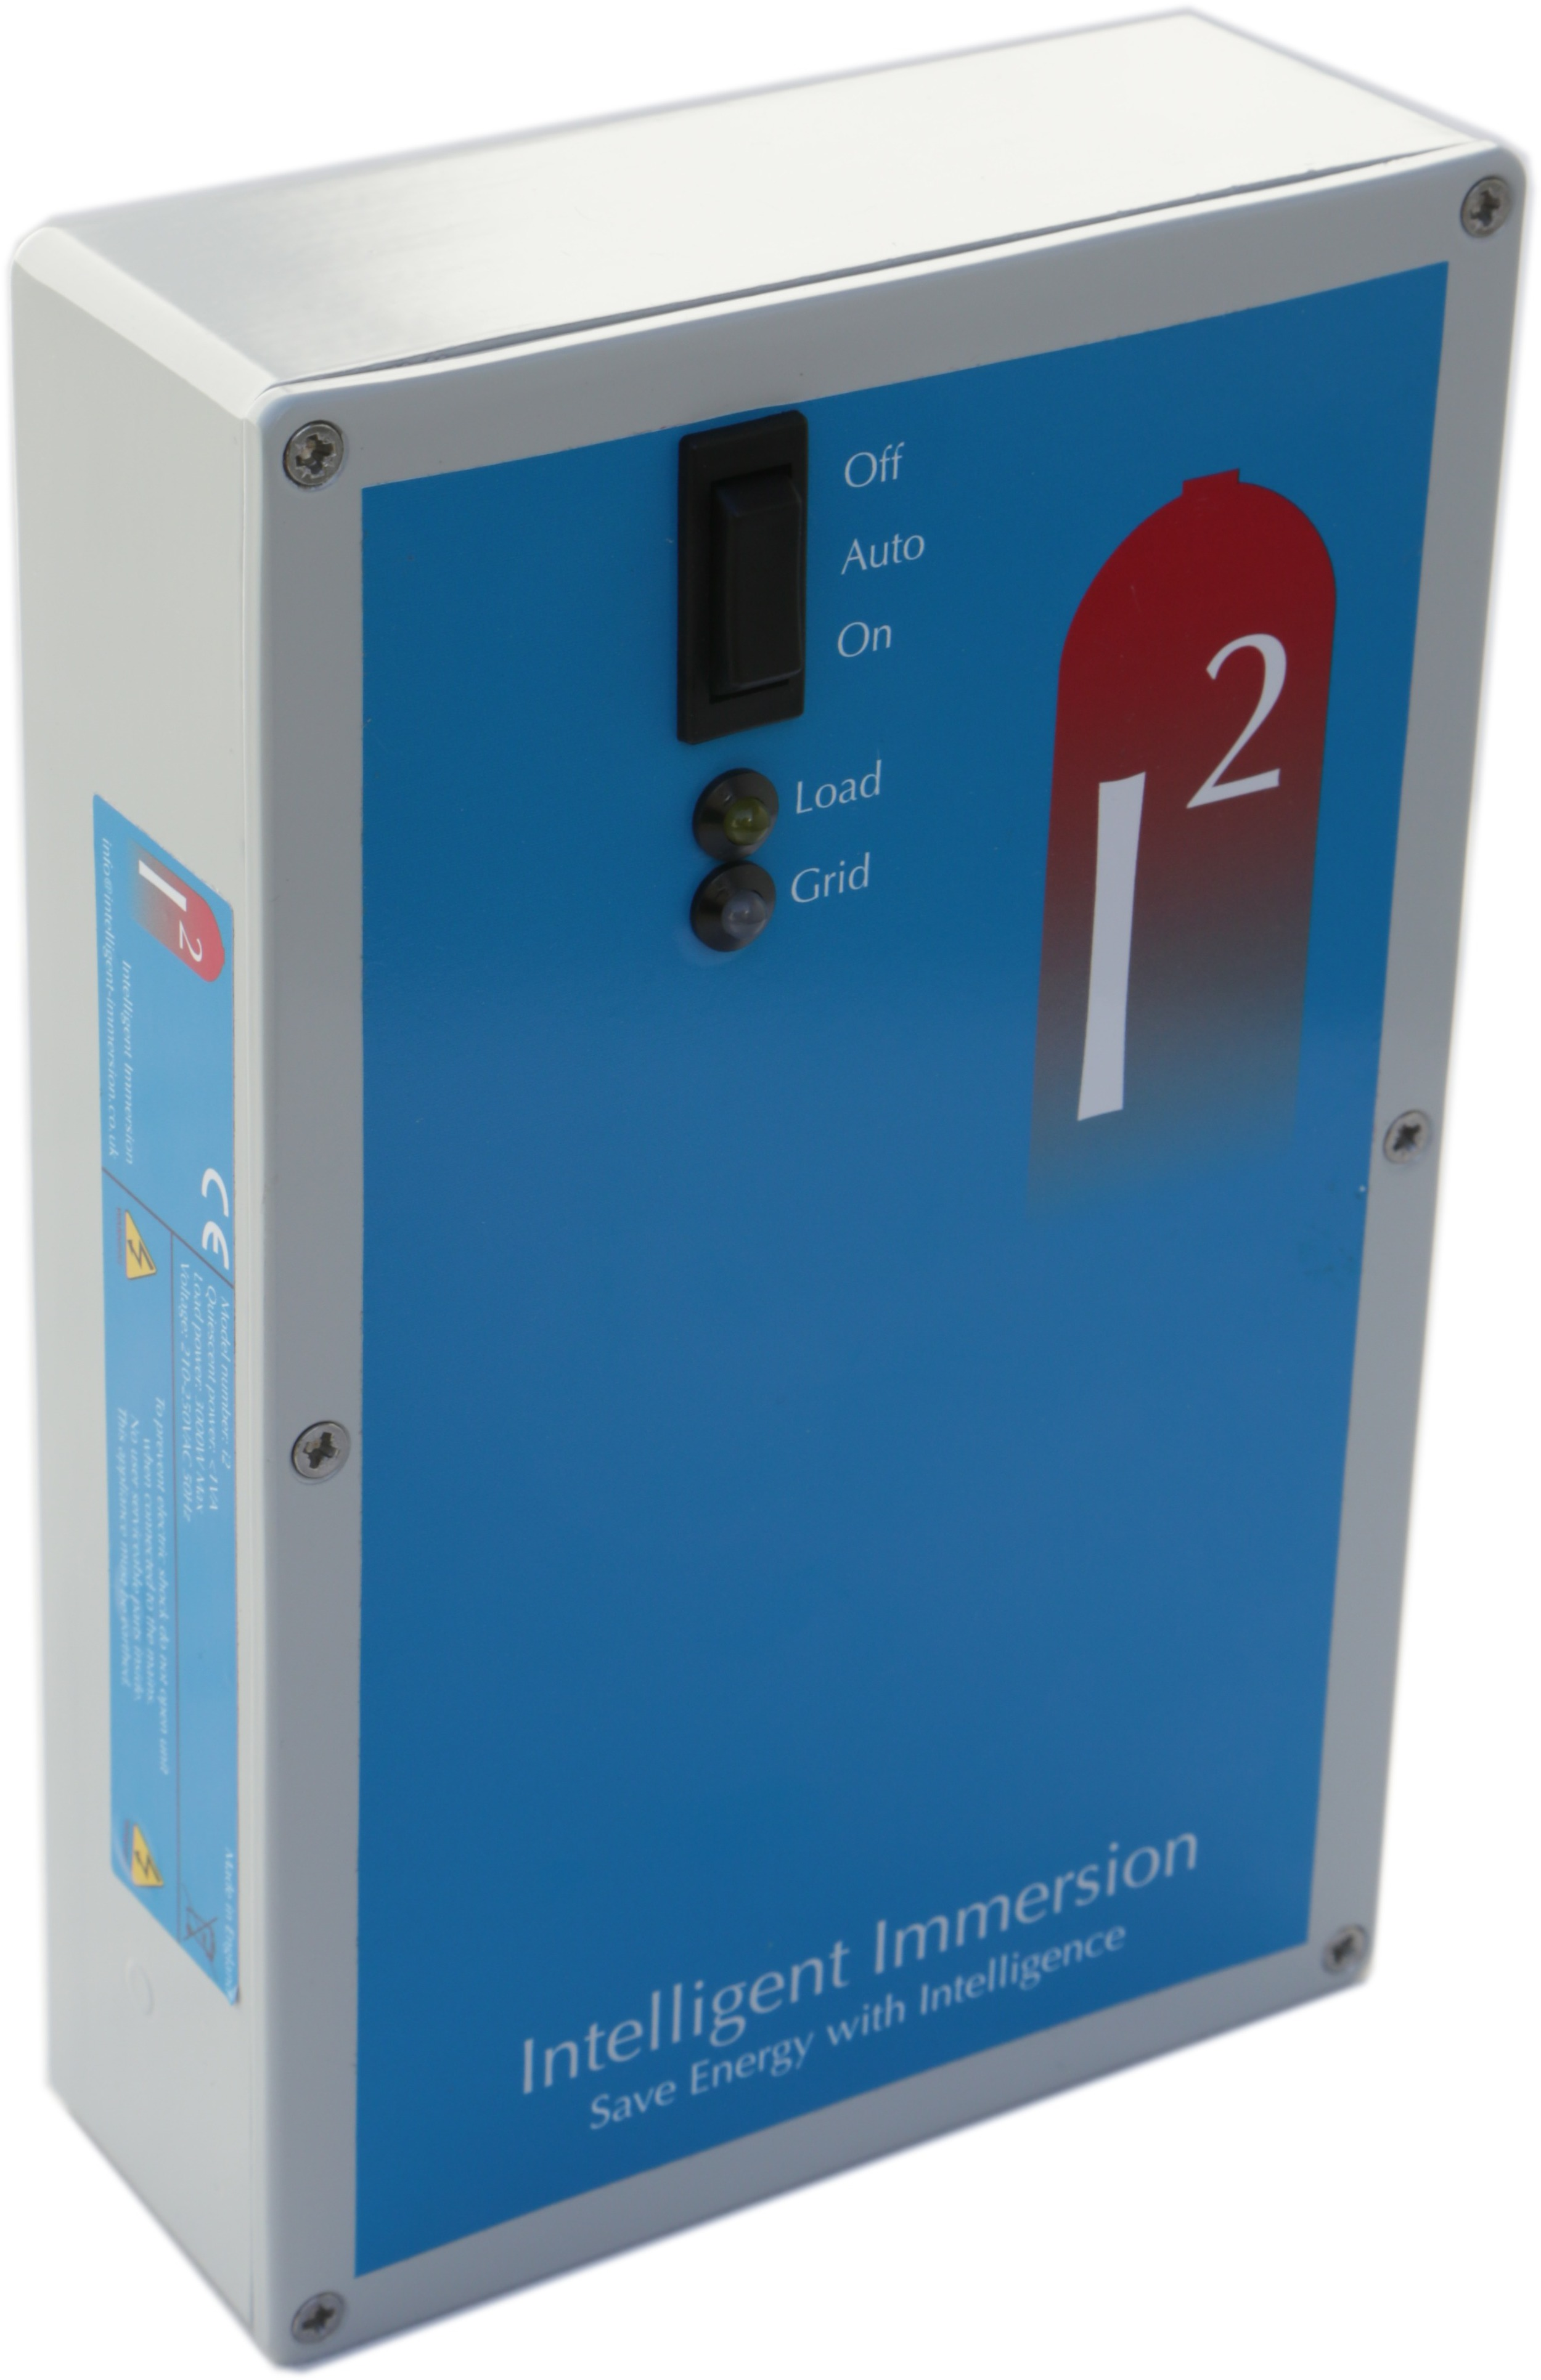 Intelligent Immersion I2